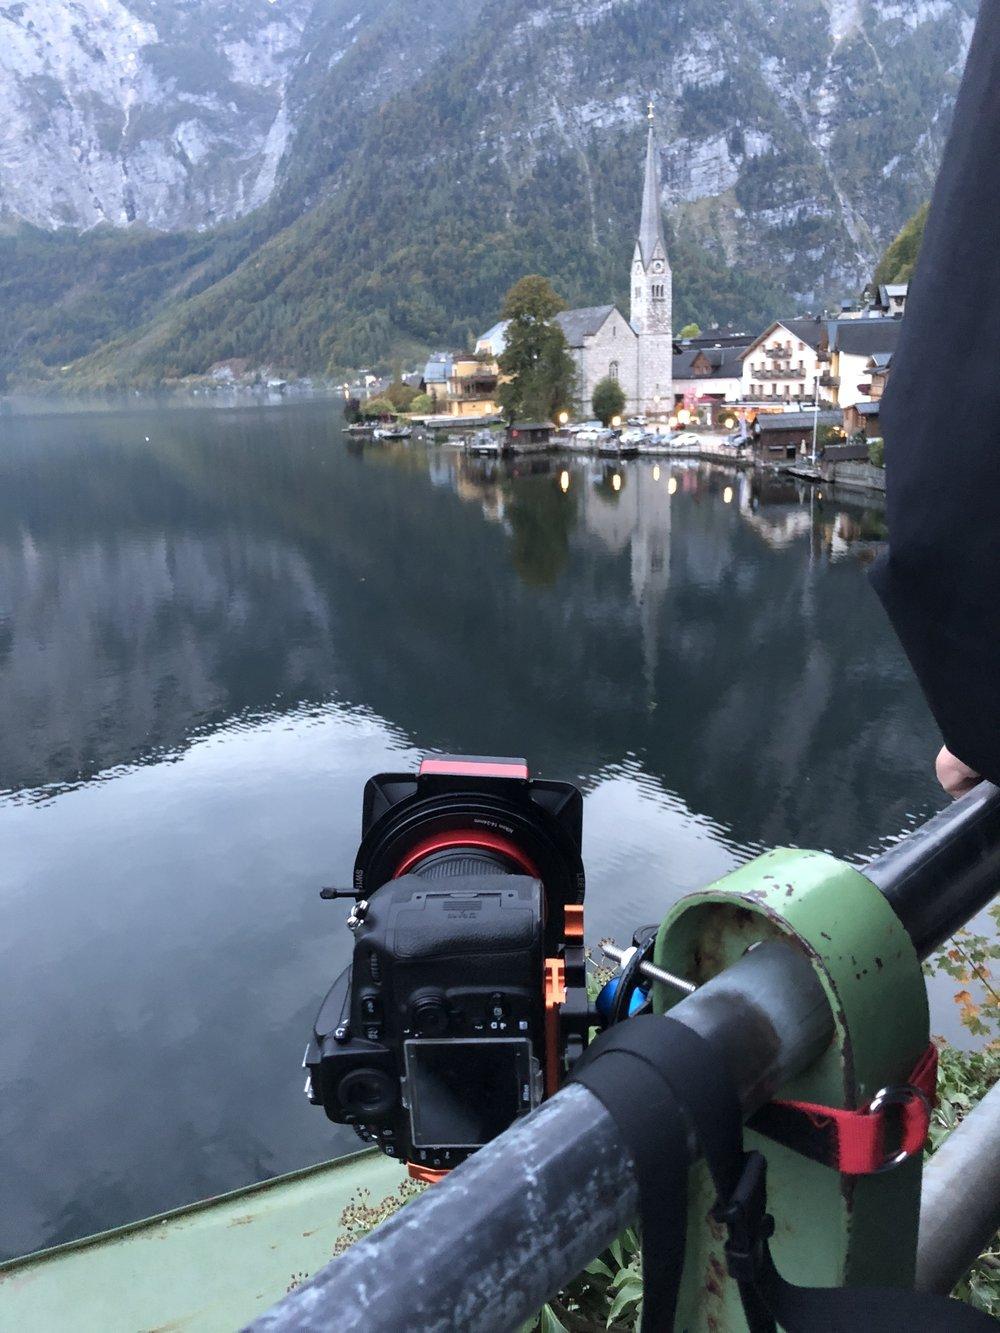 Norway travel photo bts with a platypod tripod